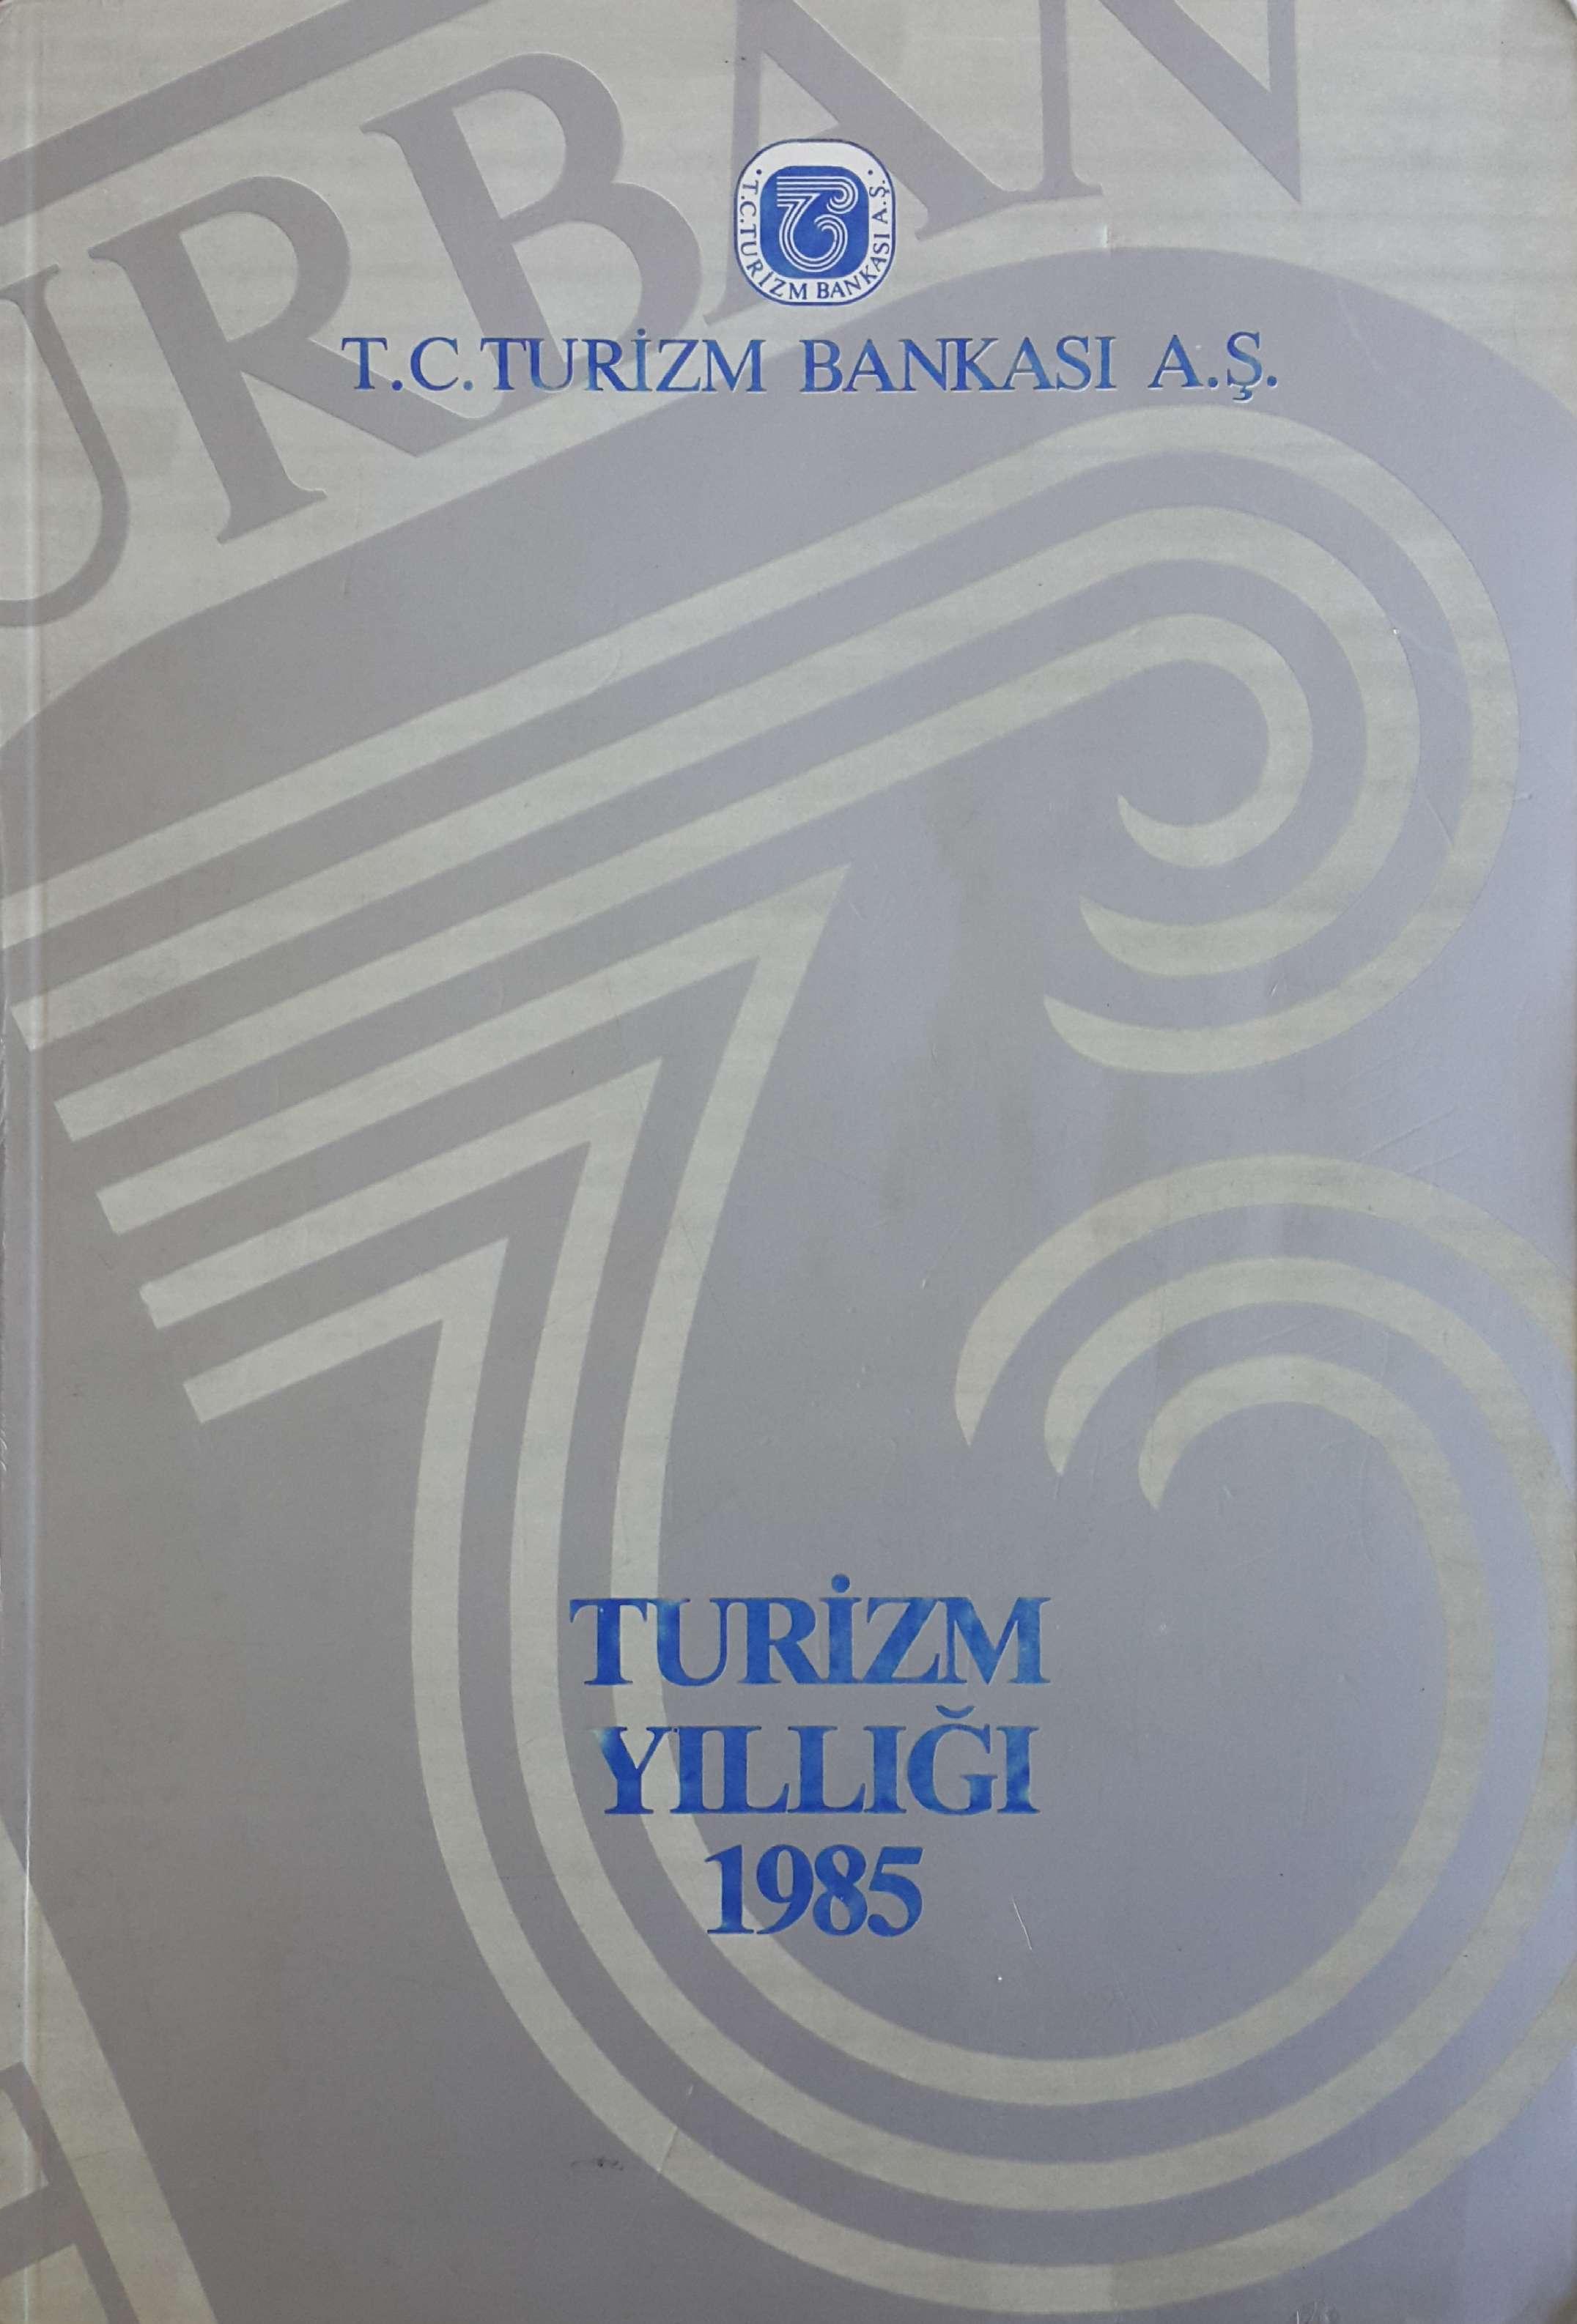 Turizm Yıllığı 1985 Kitap Kapağı